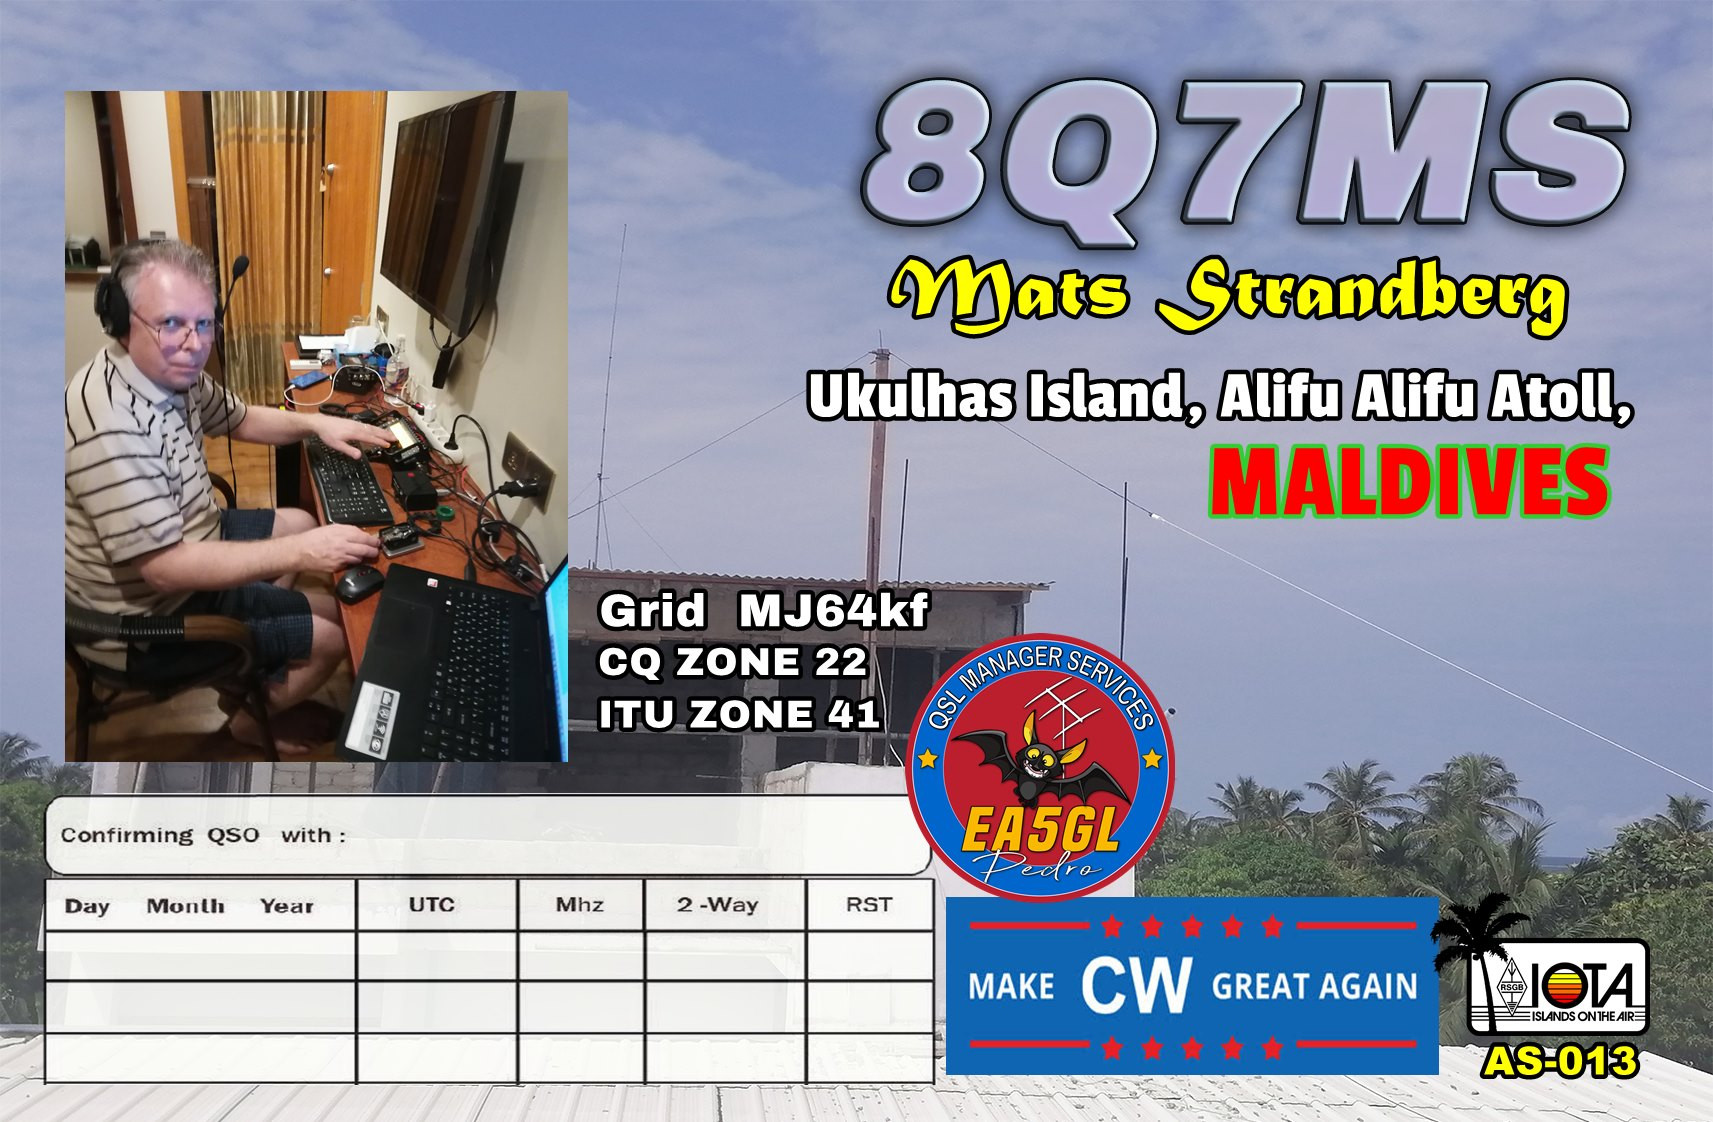 8Q7MS Ukulhas Island, Alifu Alifu Atoll, Maldive Islands QSL Card